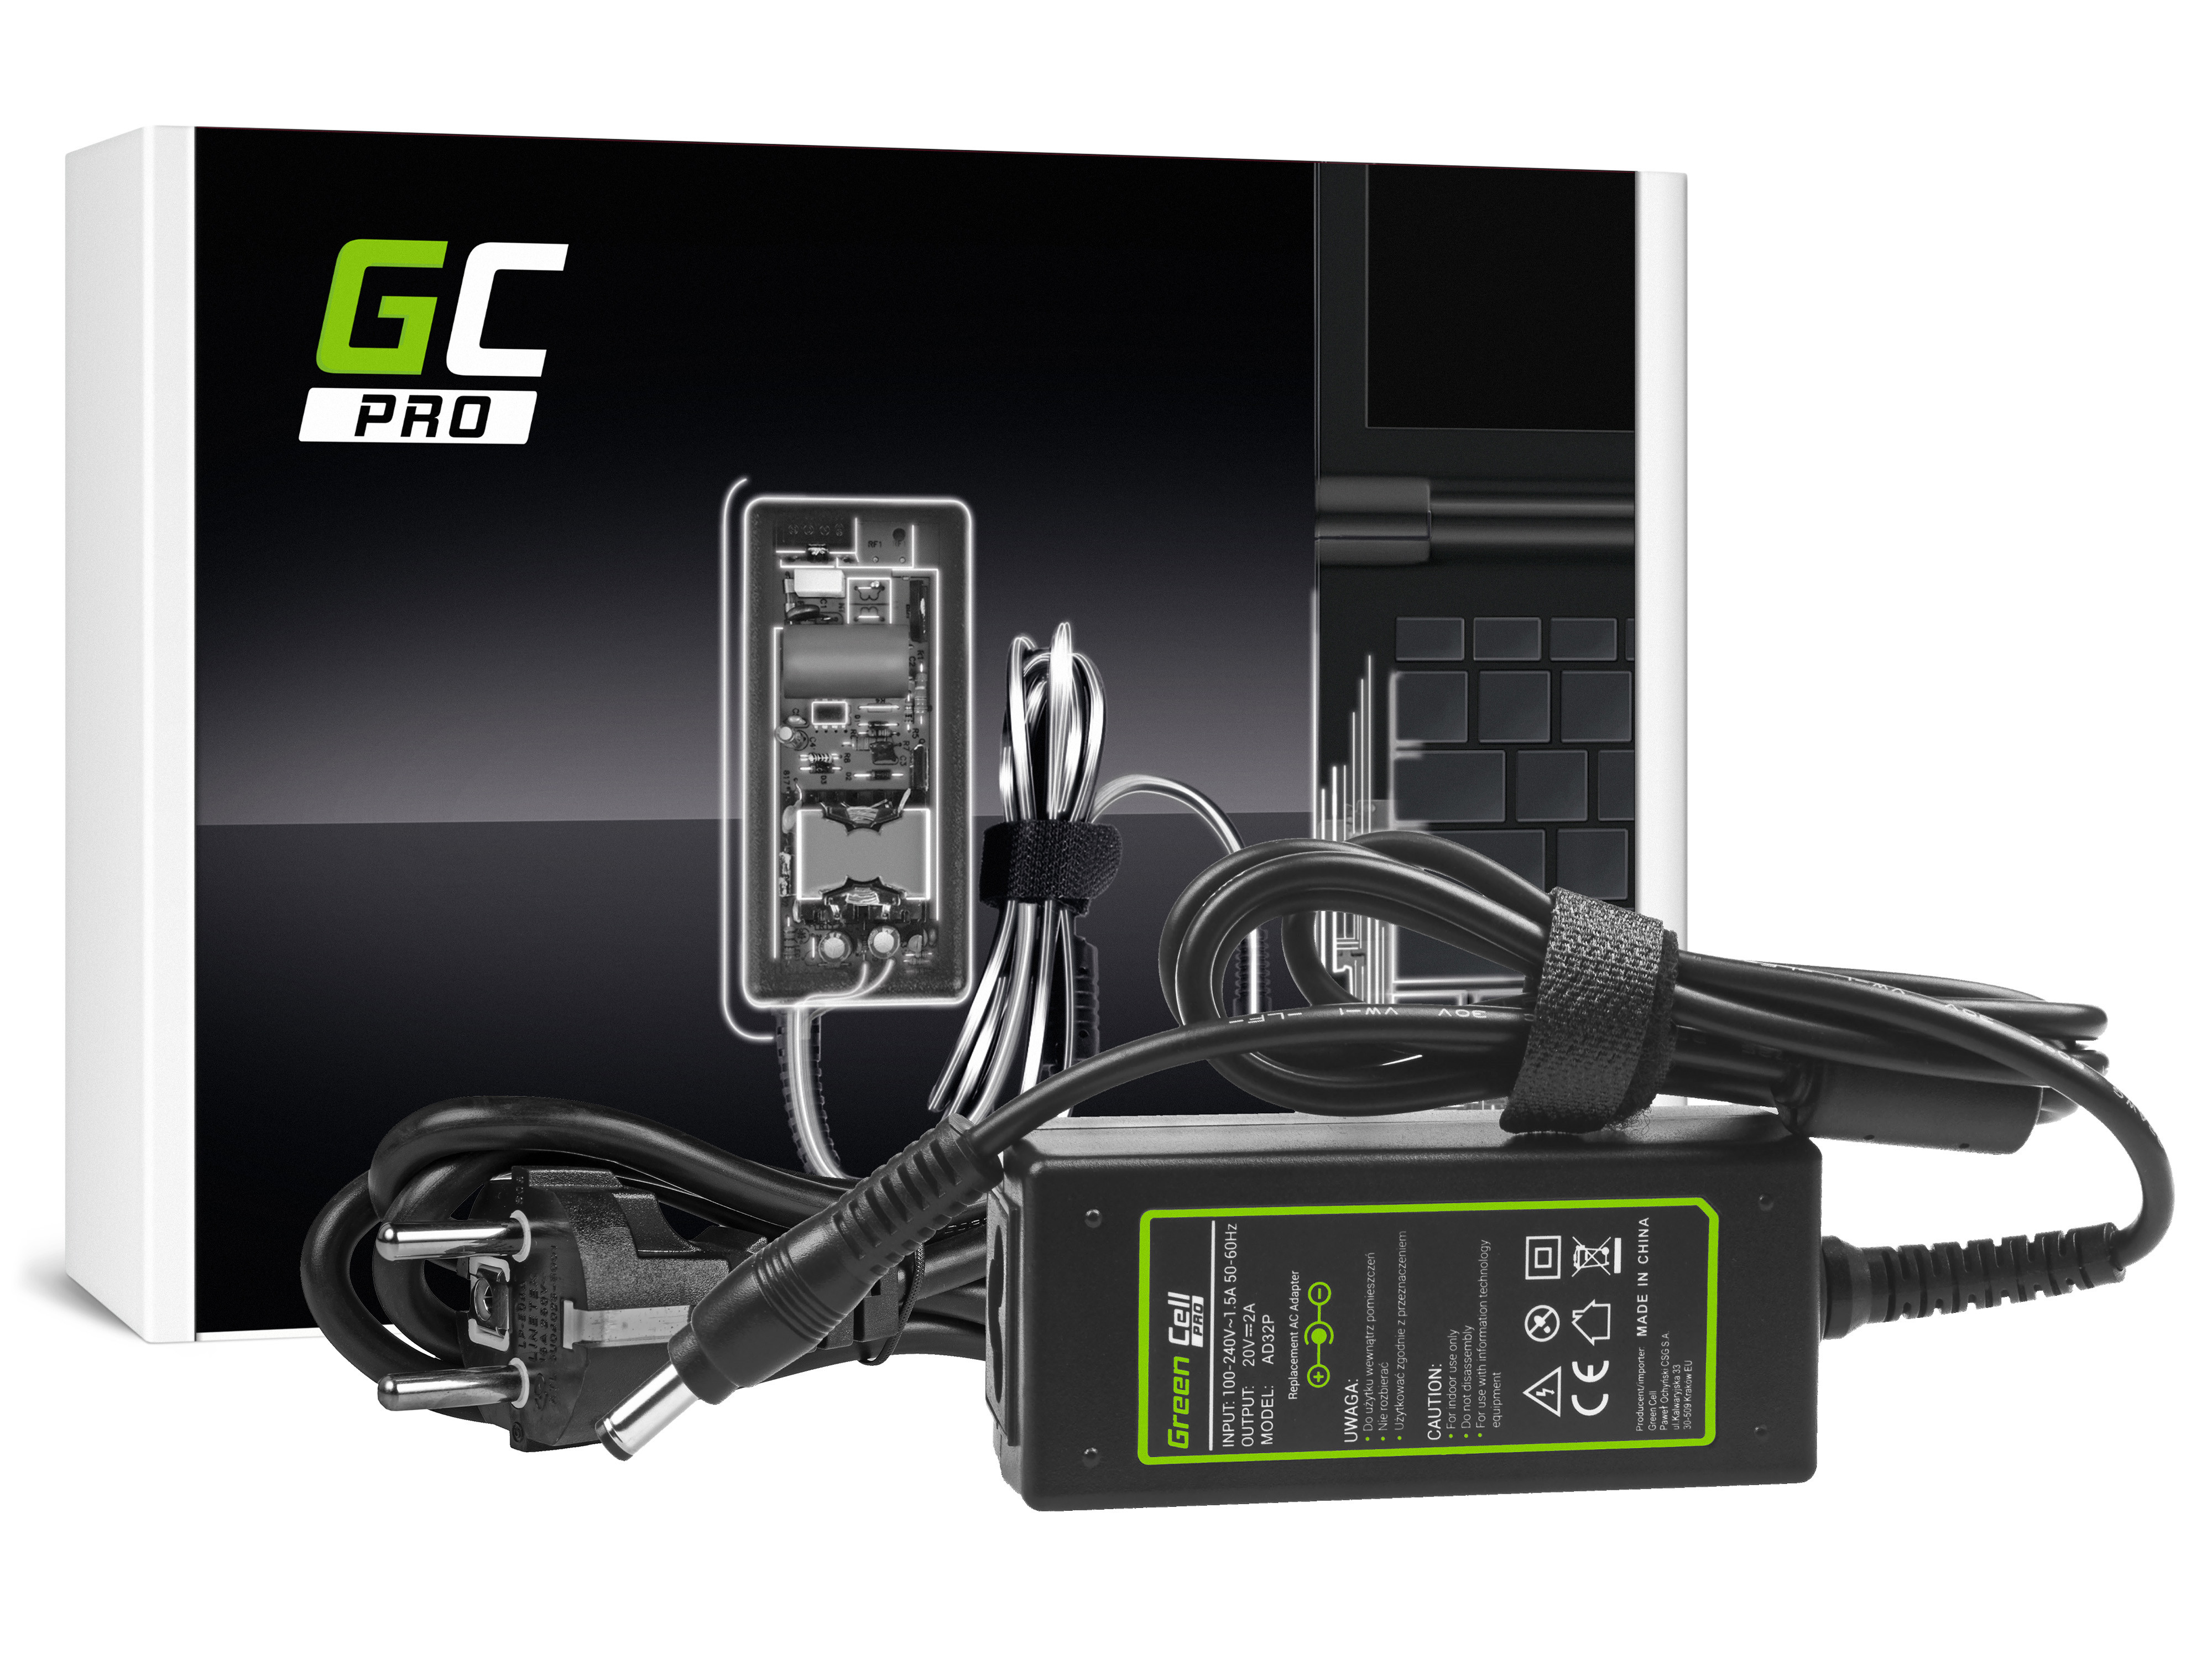 Green Cell AD32P Adaptér nabíječka pro Lenovo S9 S10 S100 S12 U150 U260 20V 2A | 40W | konektor 5.5mm-2.5mm